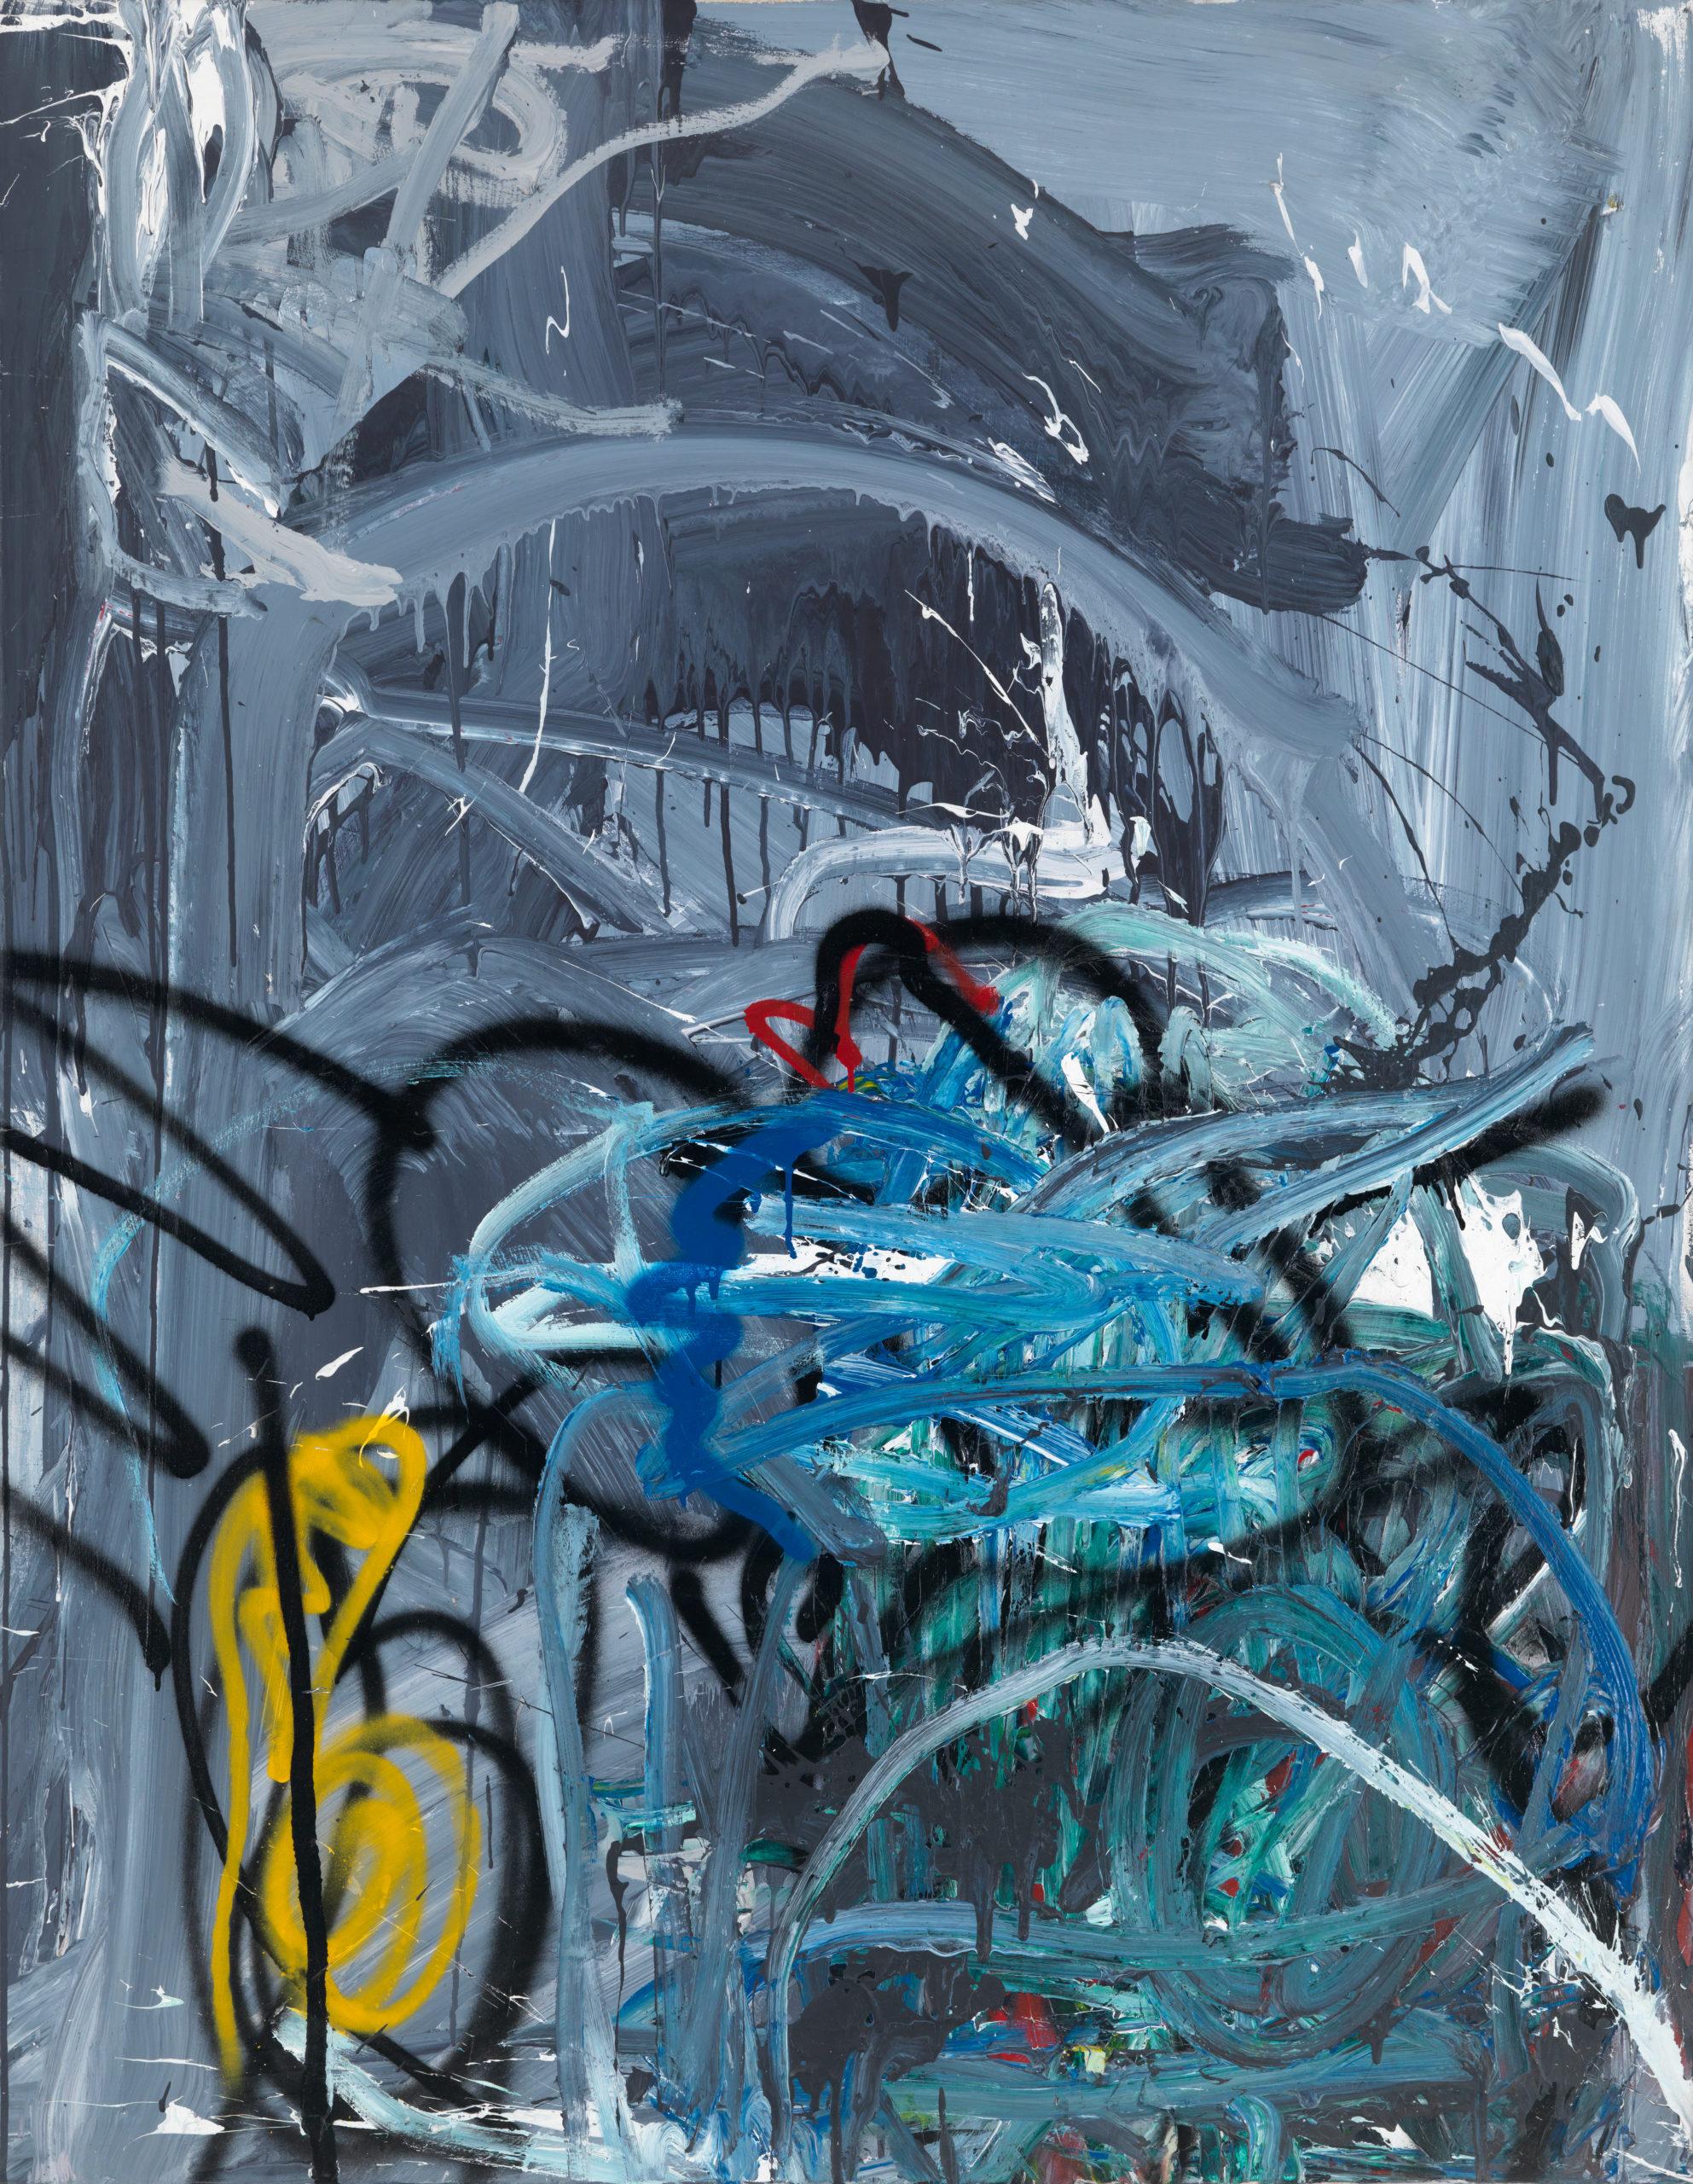 Reinhard Pods, Ohne Titel, 1983, Öl, Spray auf Leinwand, 140 x 110 cm